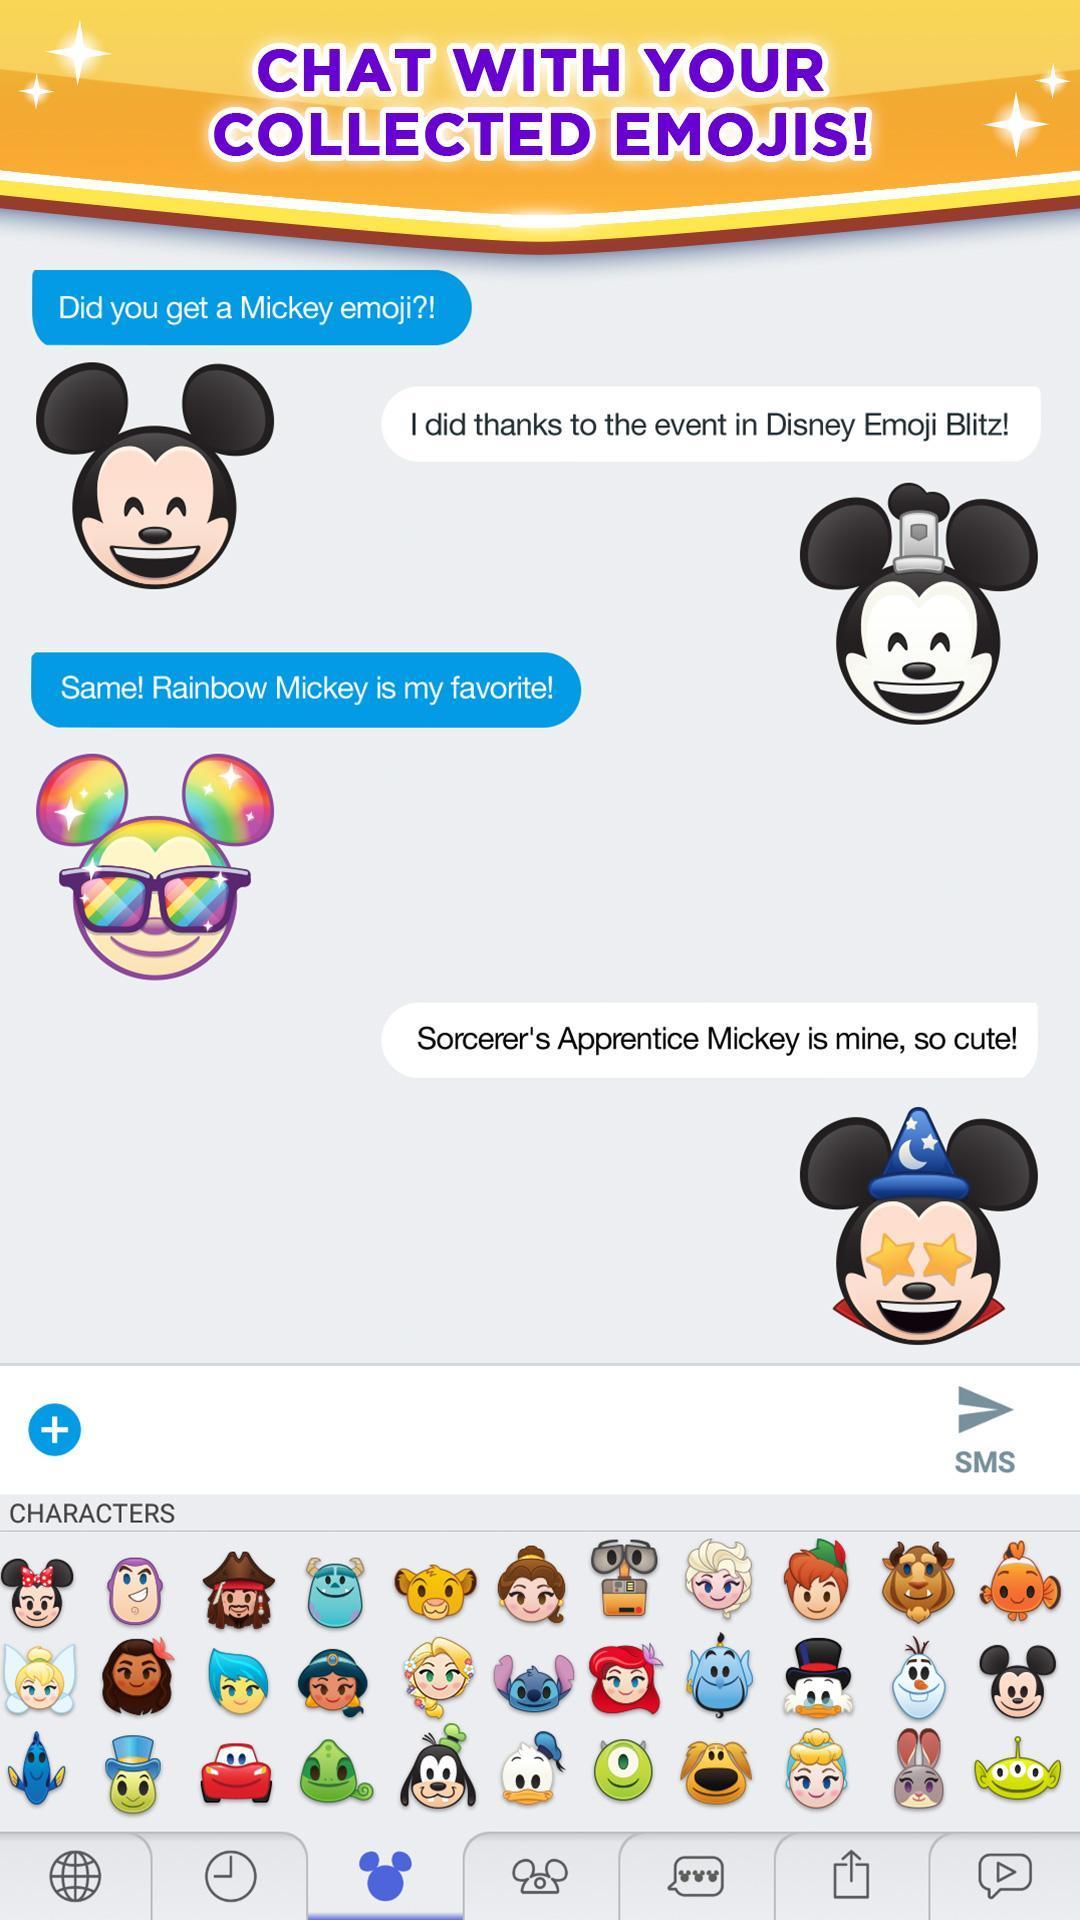 Disney Emoji Blitz For Android  Apk Download in Disney Emoji Blitz Events Calendar